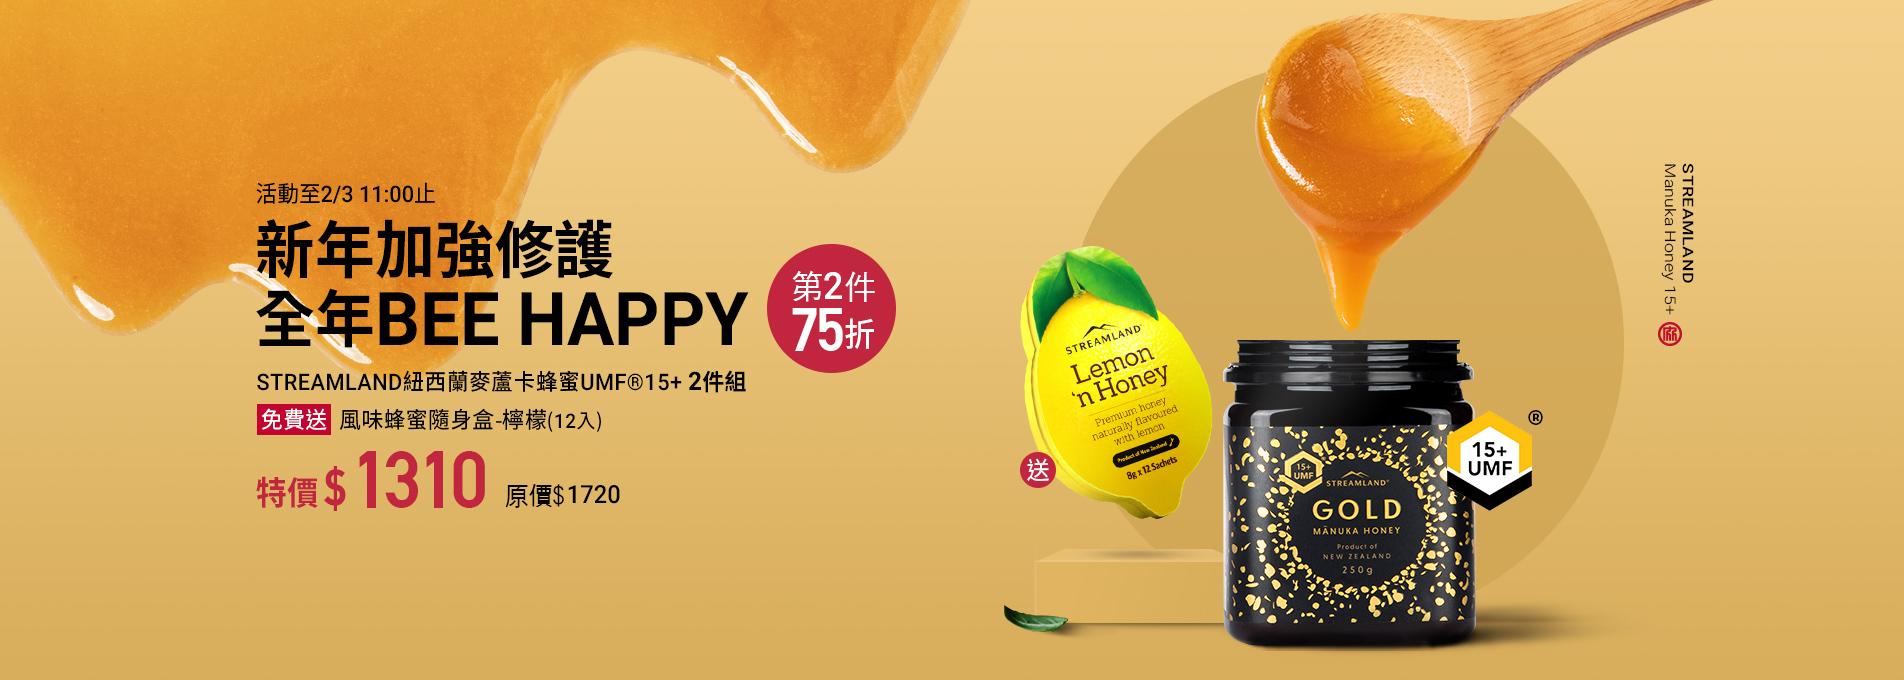 STREAMLAND紐西蘭新溪島 麥蘆卡蜂蜜UMF®15+ 250g